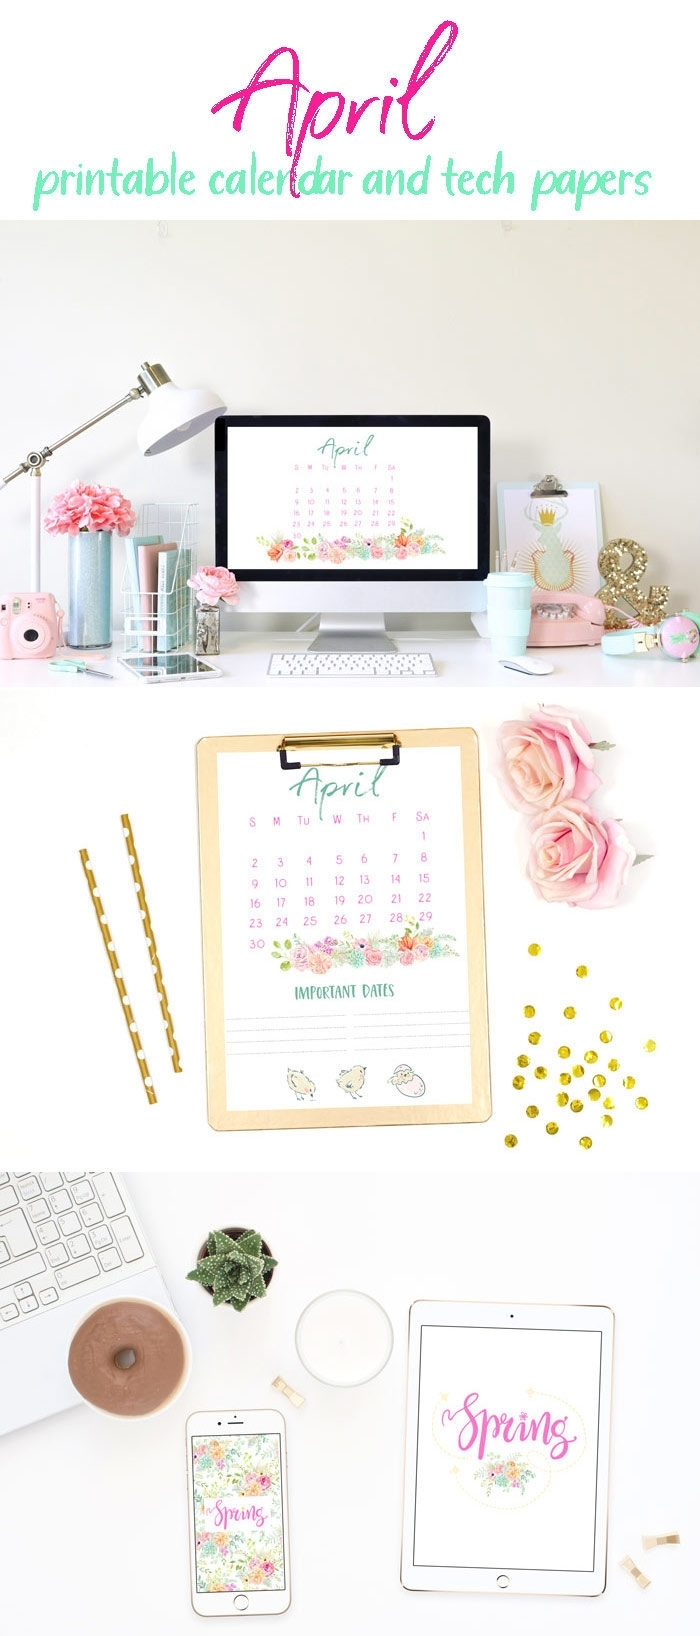 April 2018 Printable Calendar And Tech Papers